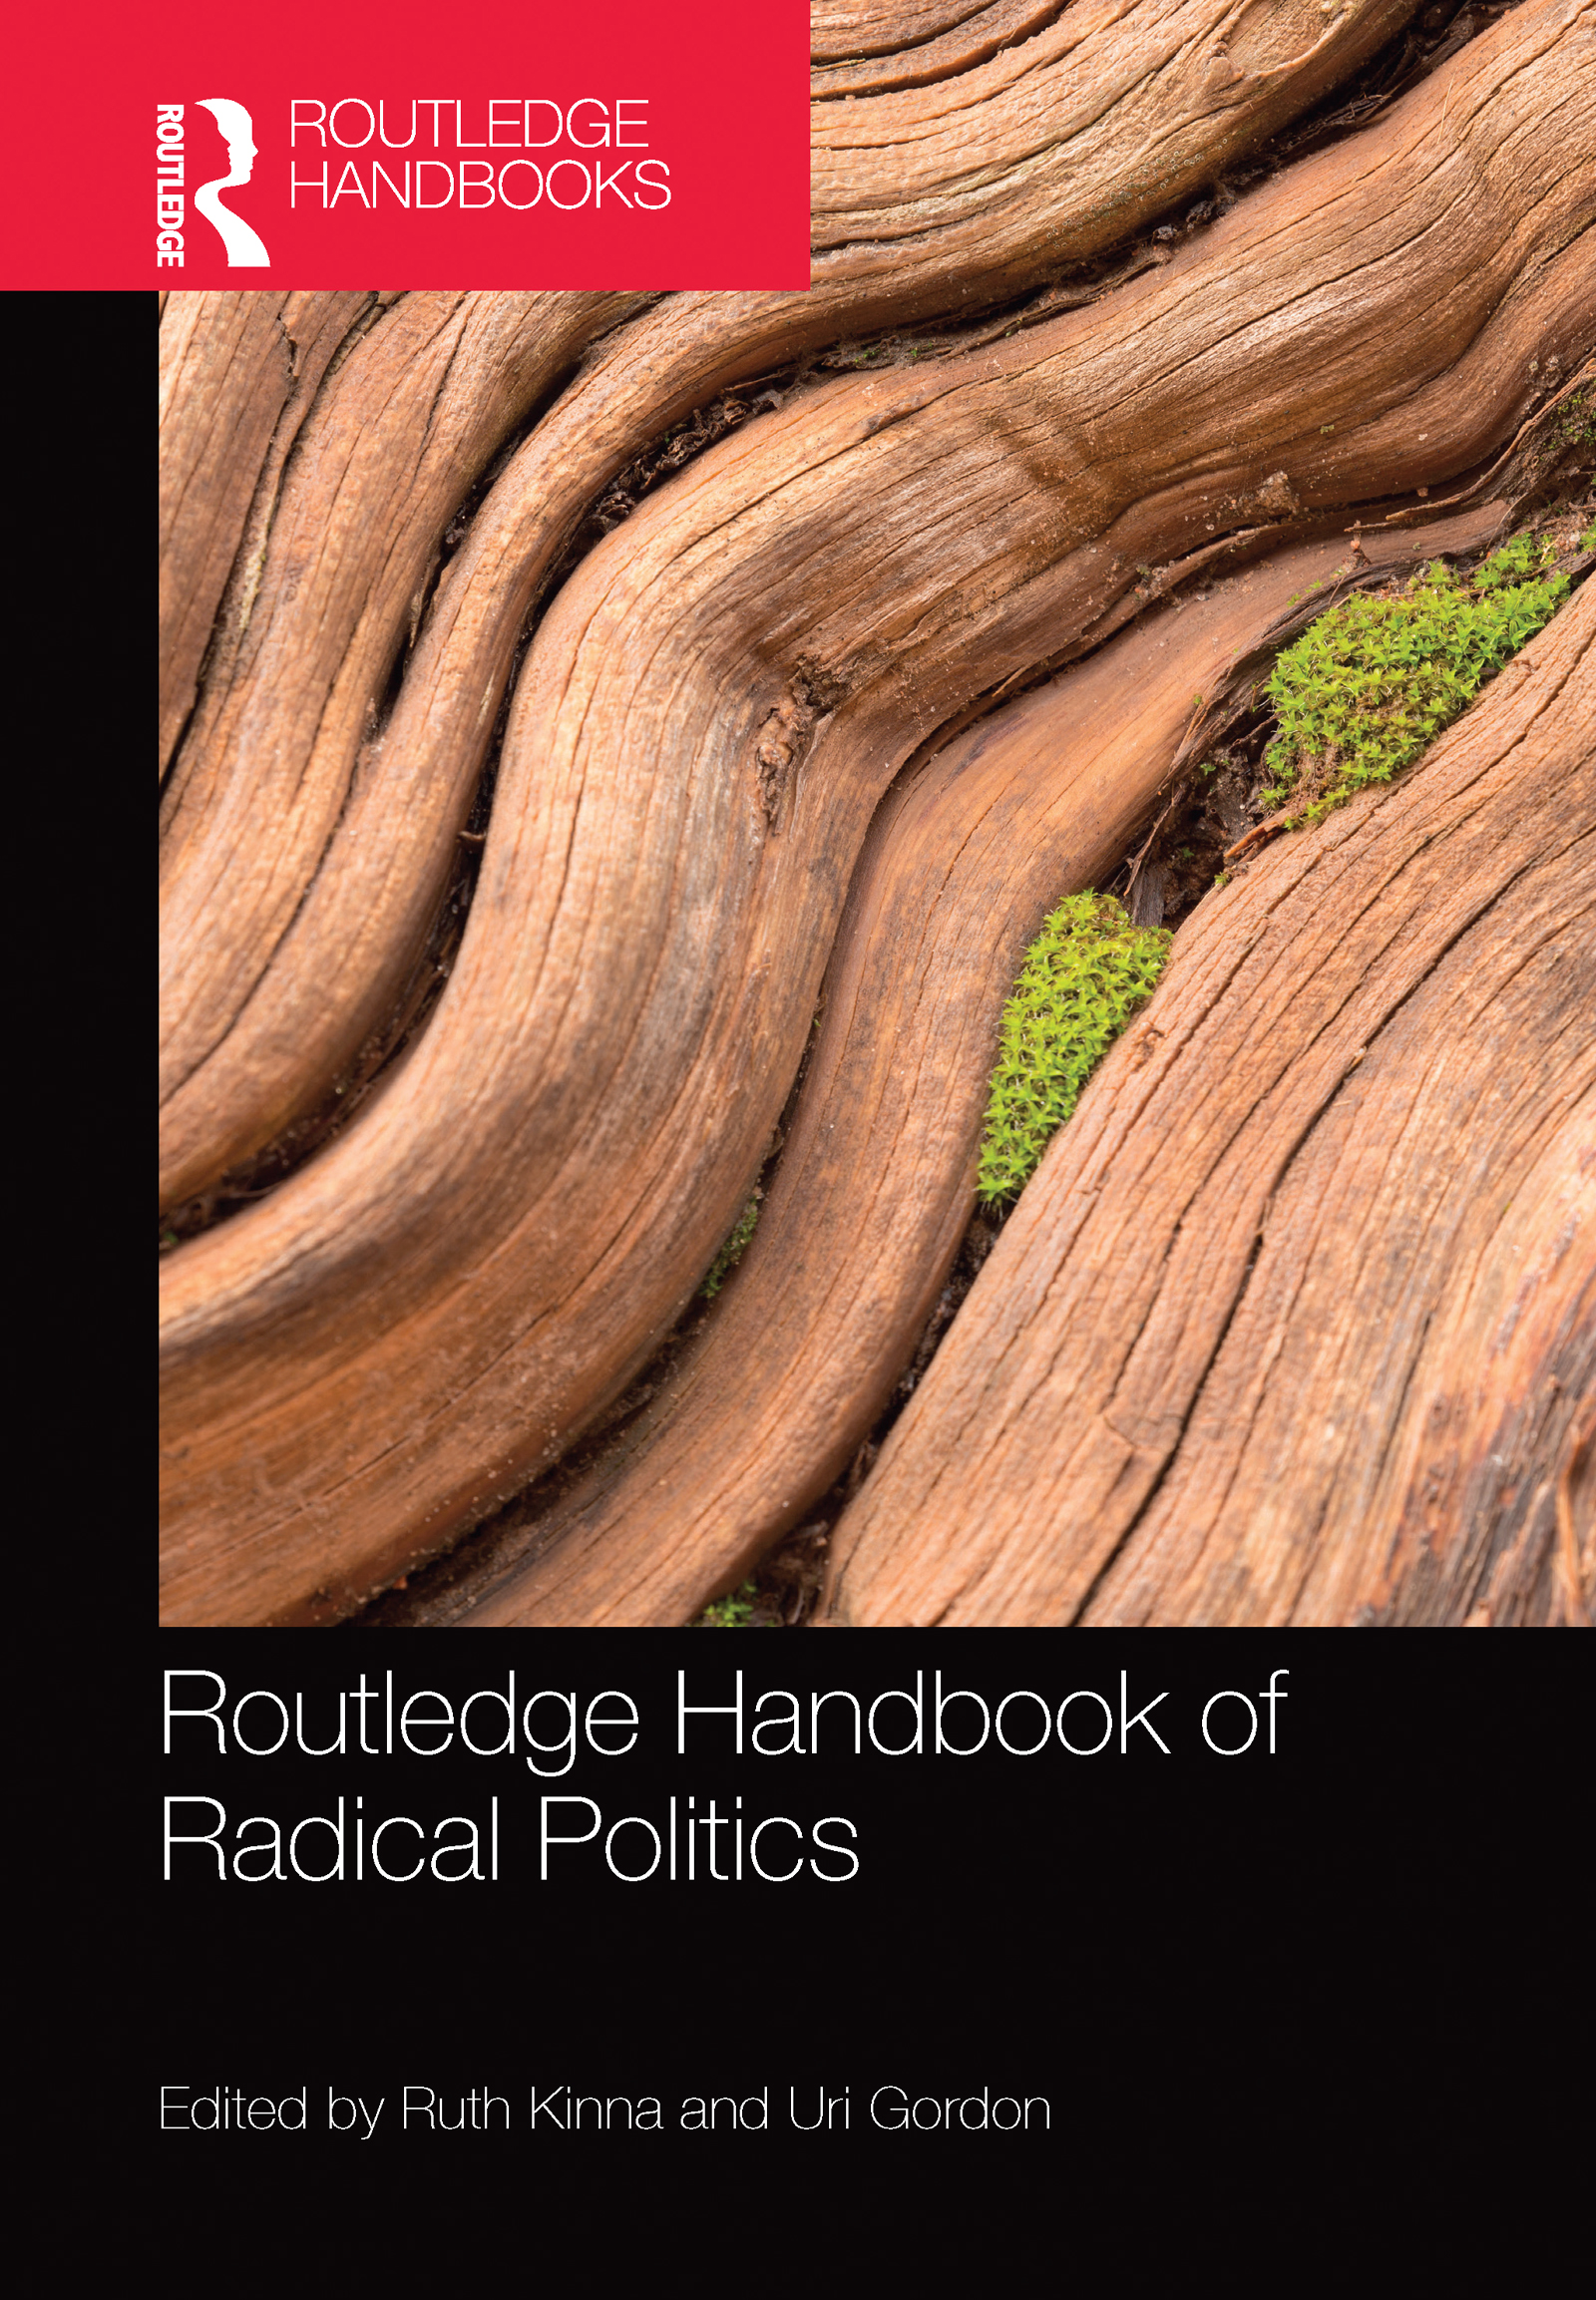 Routledge Handbook of Radical Politics